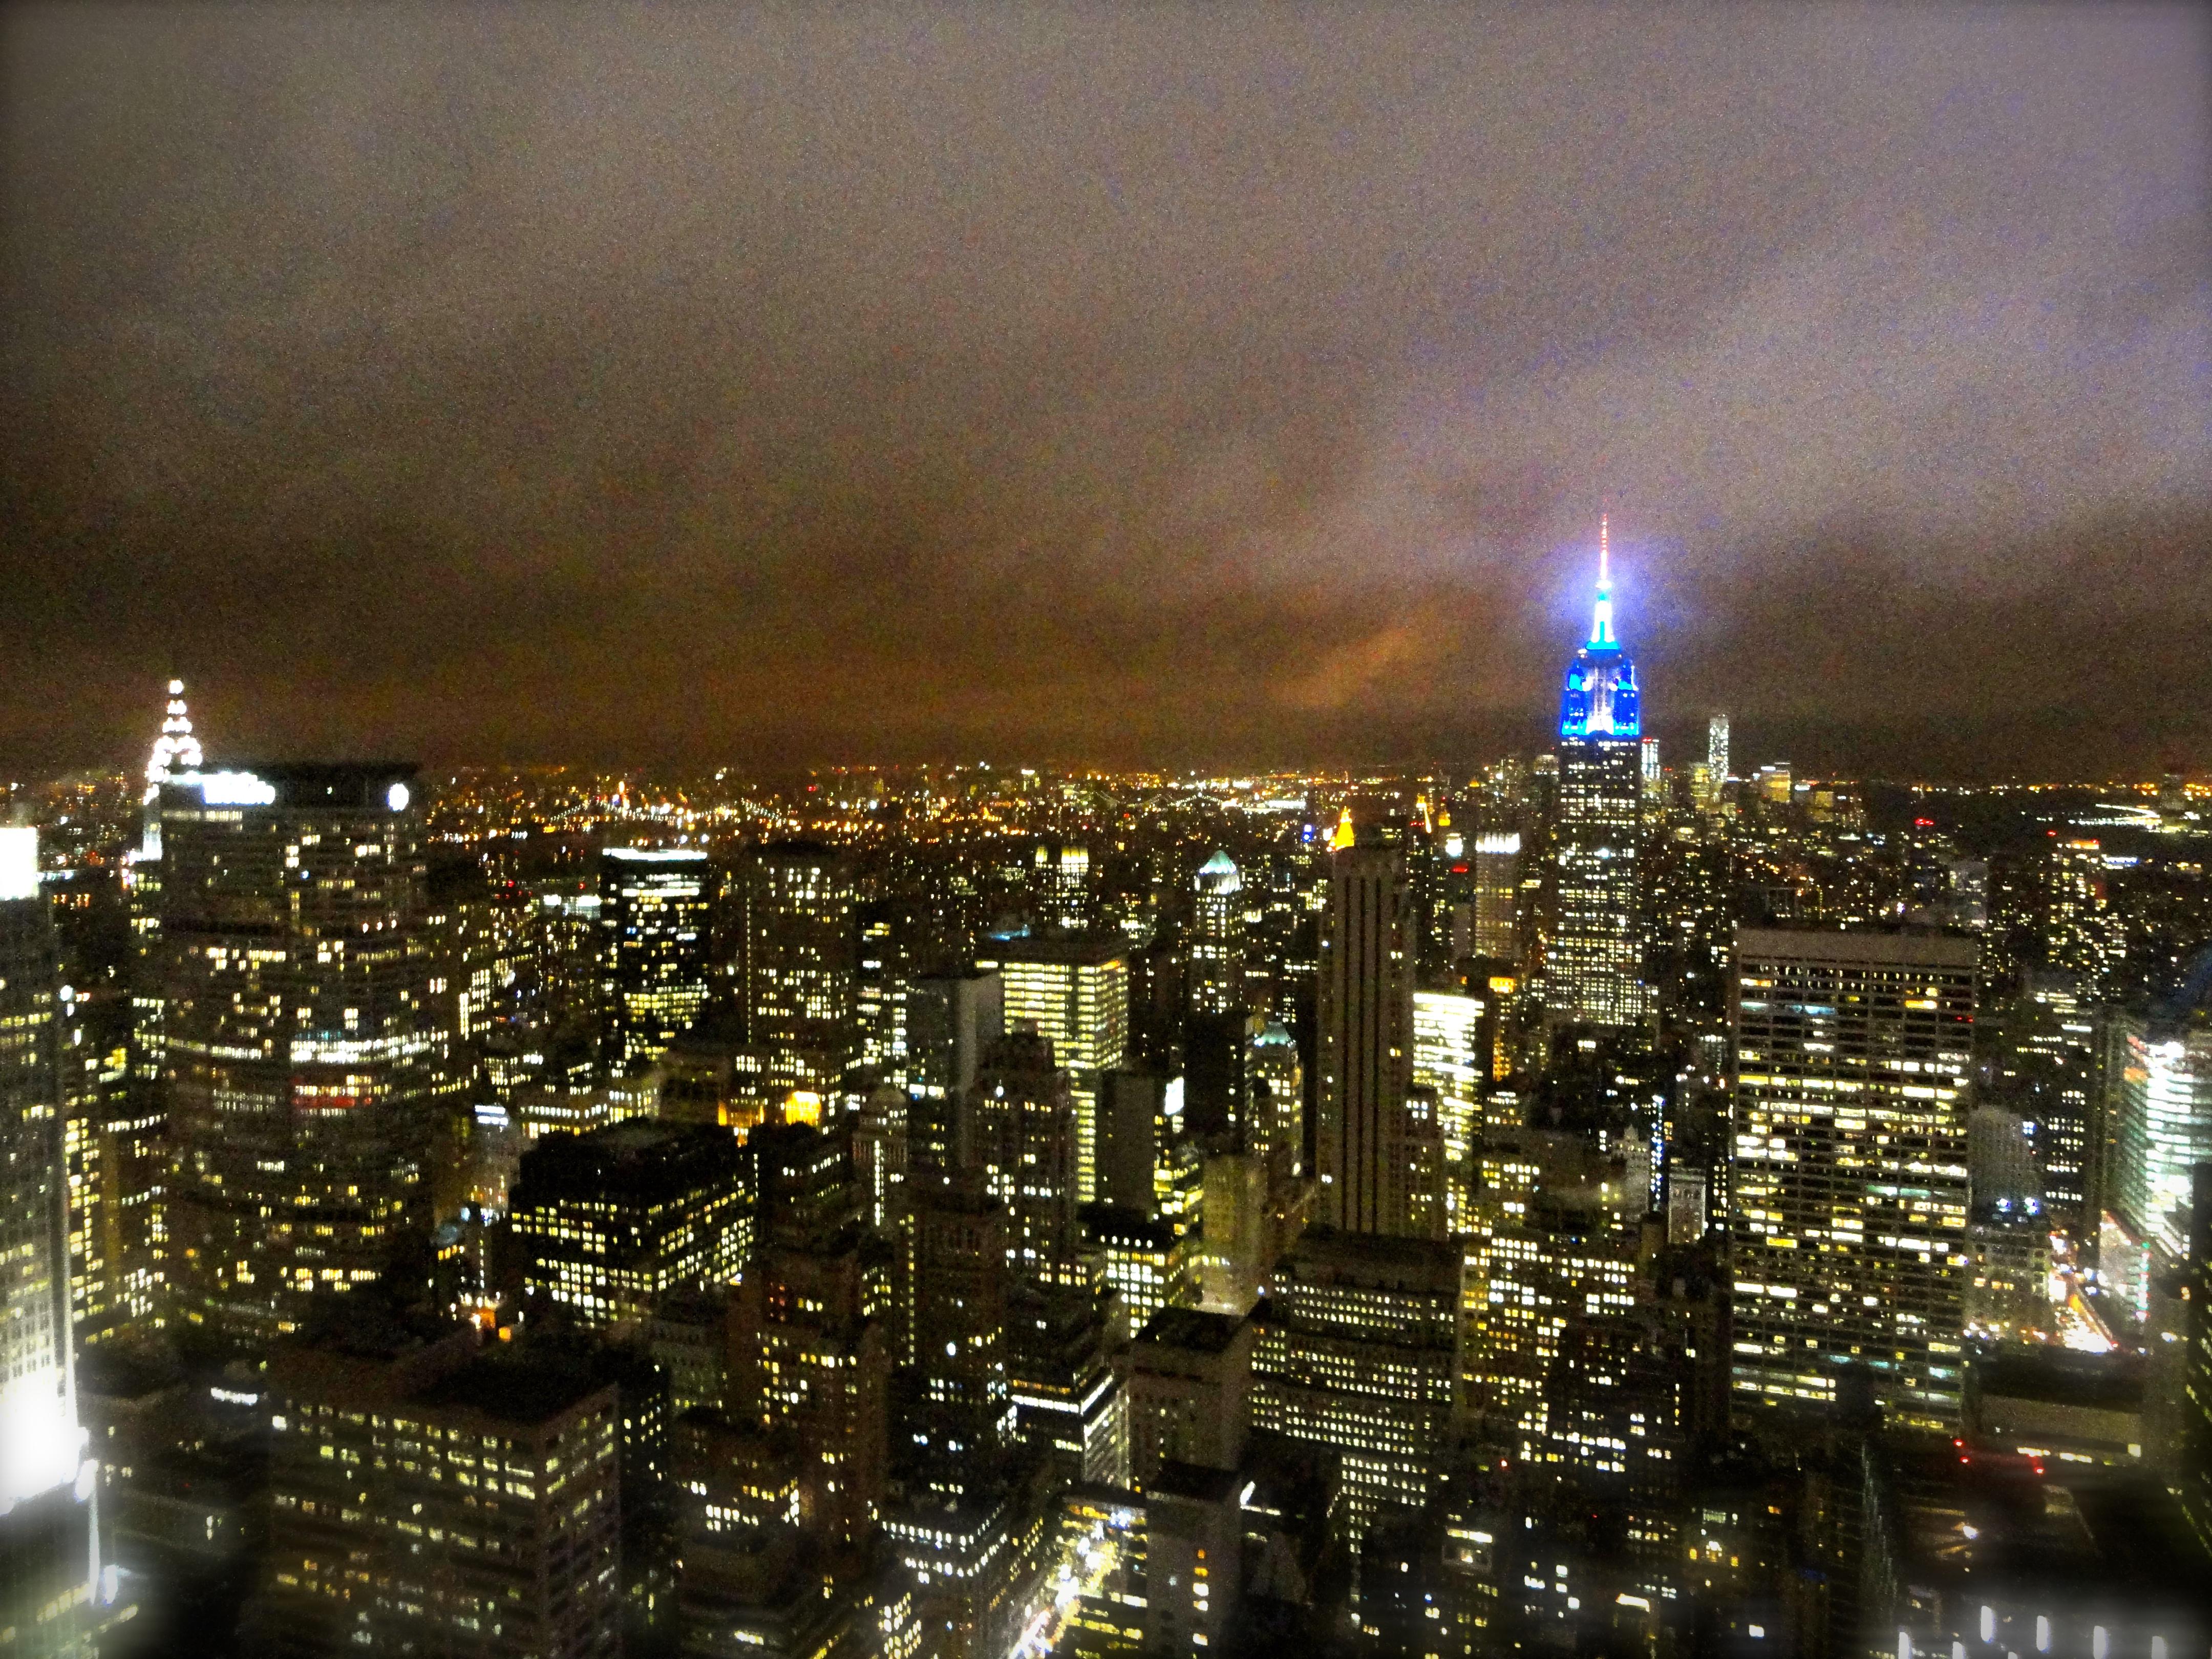 Top of the Rock NYC at Christmas | Whaddup JP